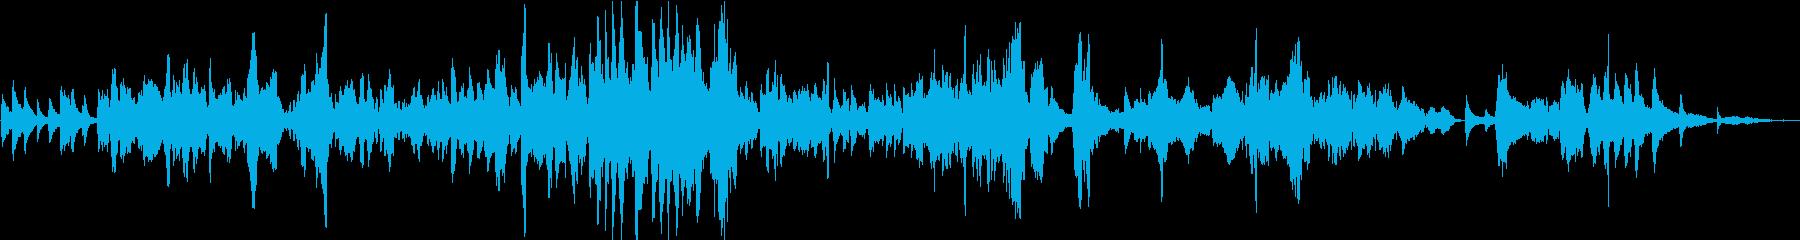 "Glazunov ""Meditation"" / live violin's reproduced waveform"